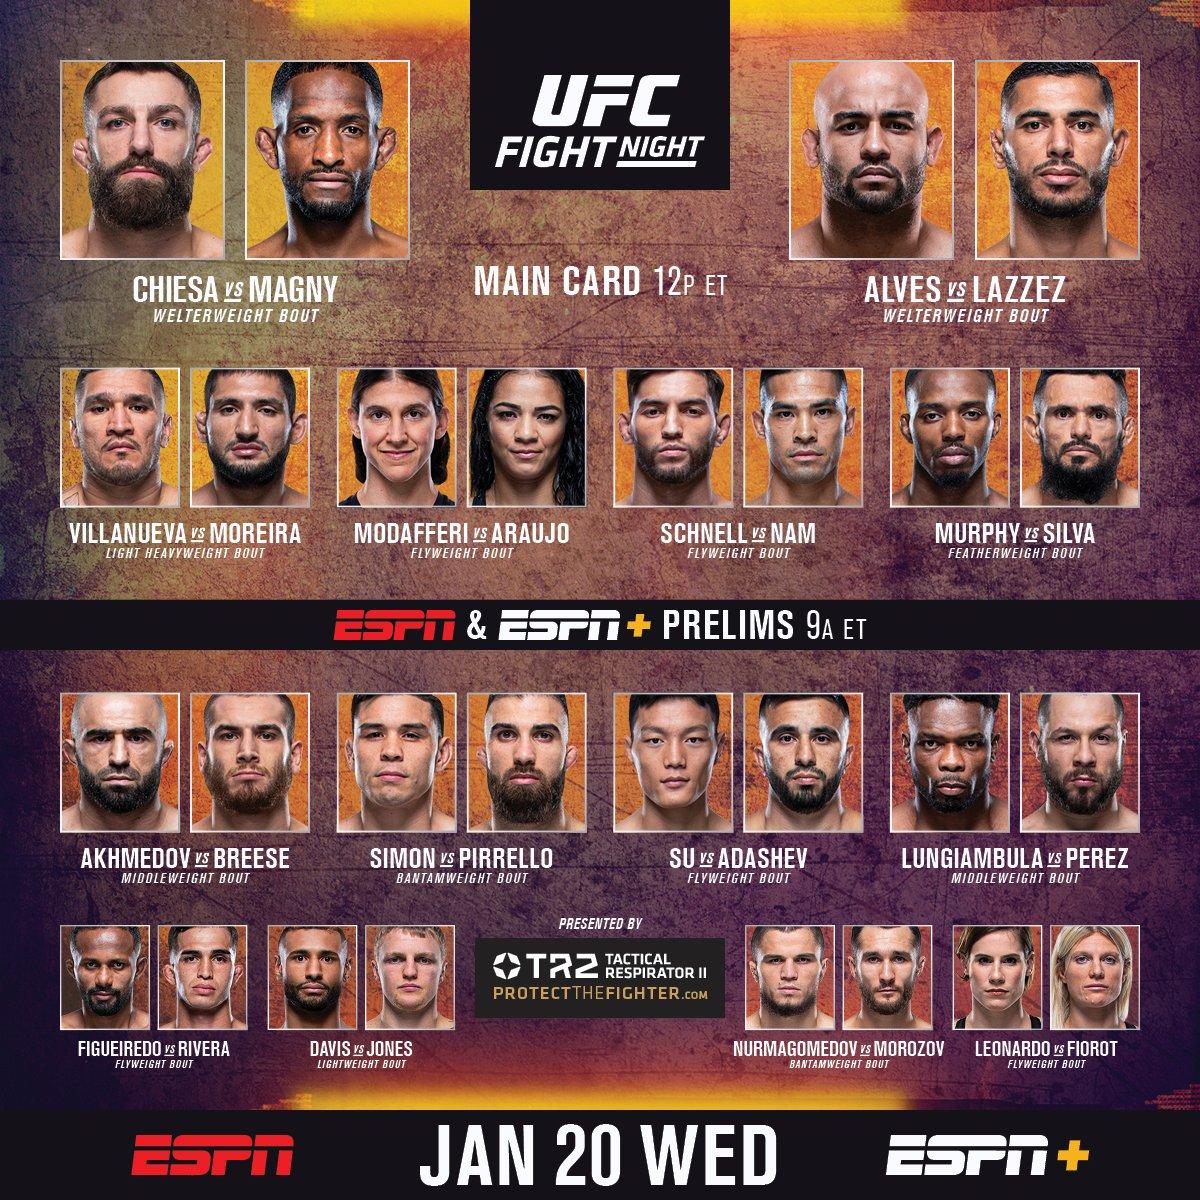 Triple Header Week continues! 🏝  #UFCFightIsland8 is coming at you LIVE on @ESPN & #ESPNPlus.   [ B2YB @O2Tactical ] https://t.co/bpJz5kekJX